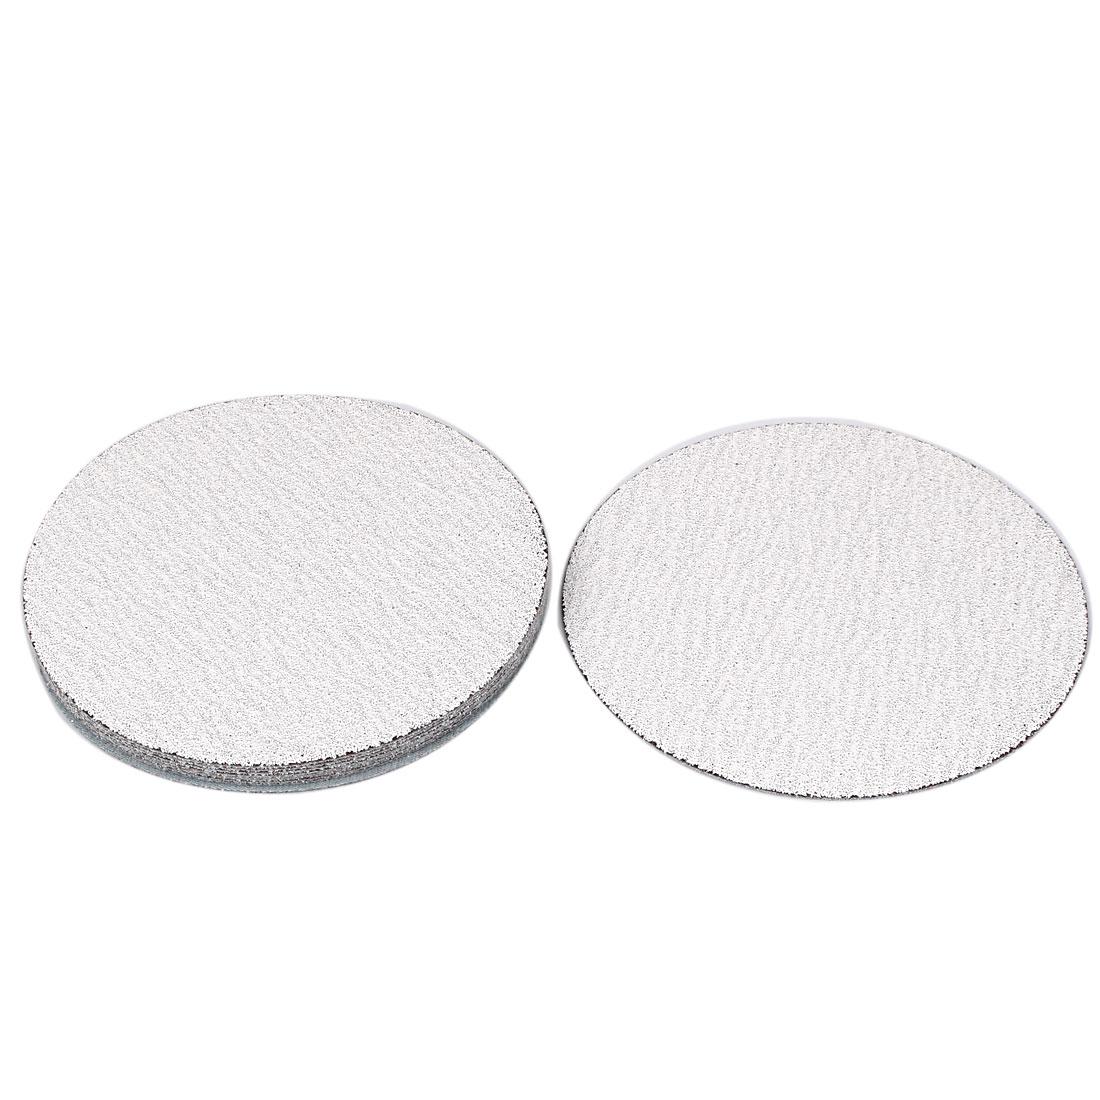 "5"" Dia Polishing Round Dry Abrasive Sanding Sandpaper Sheet Disc 80 Grit 10pcs"